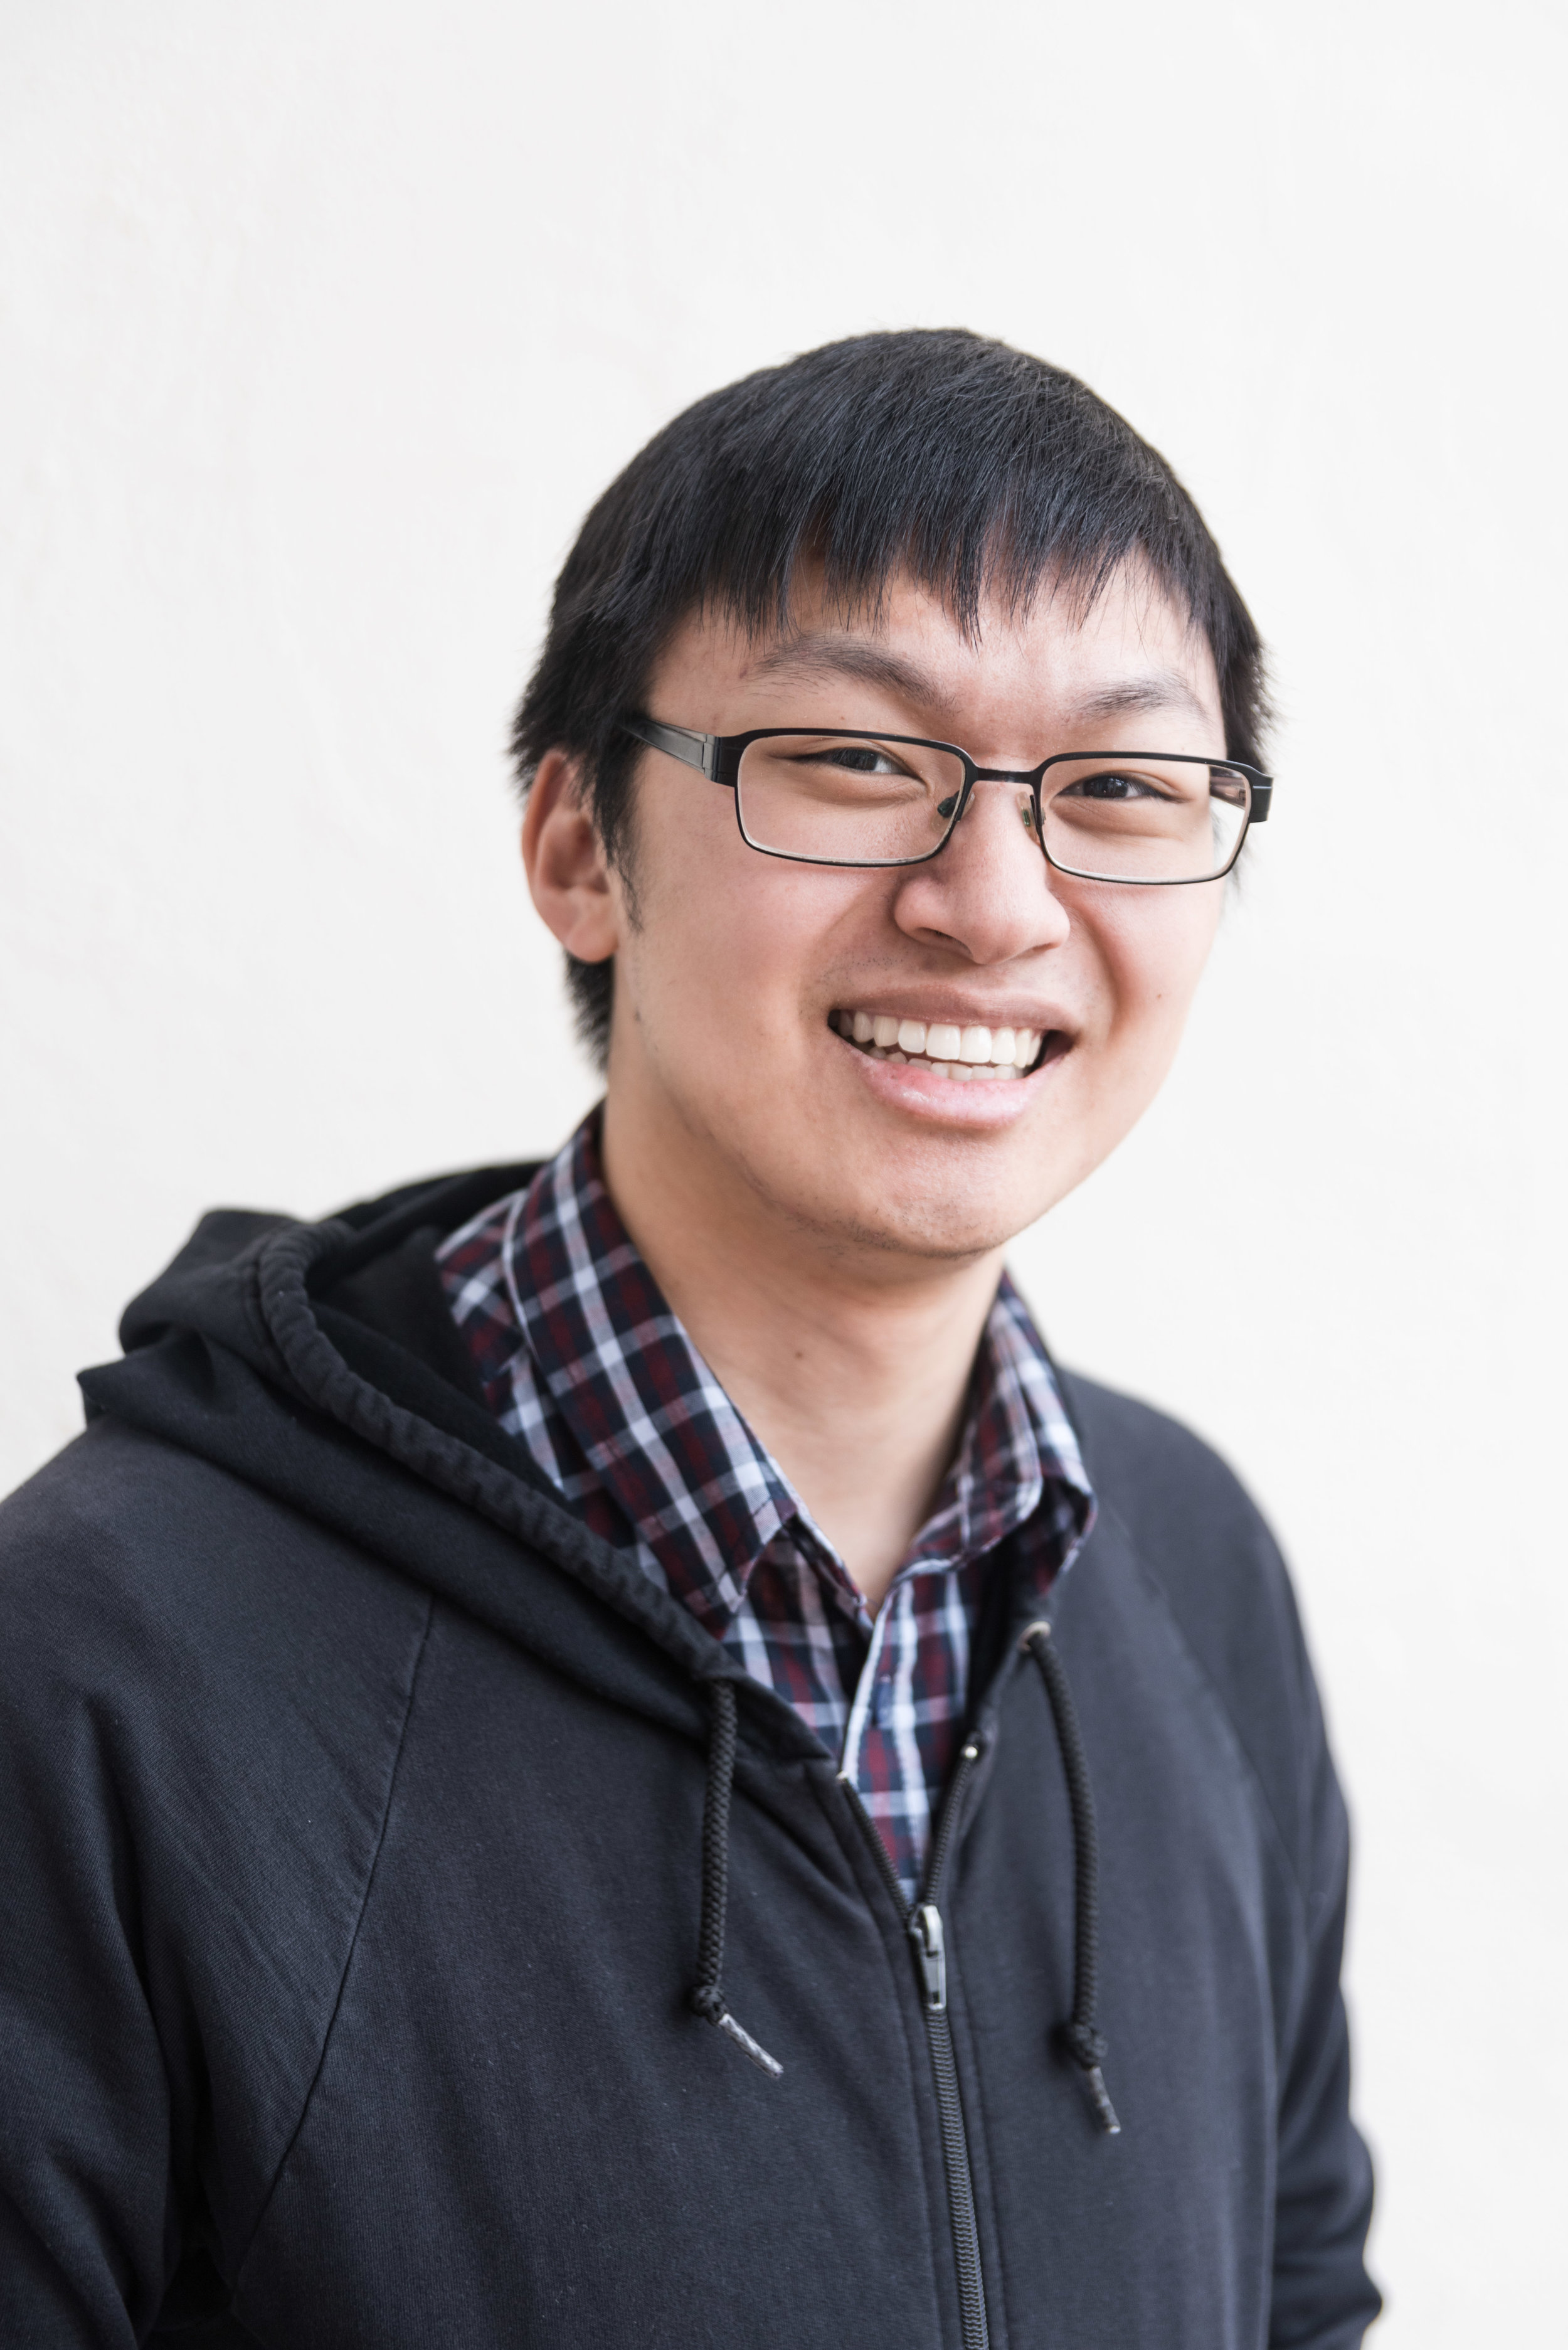 Nick Tam - FIELD:EngineeringTIME IN FIELD: 1.5 yearsCOMFORT FOOD:Kimchi stew (Kimchi jjigae)